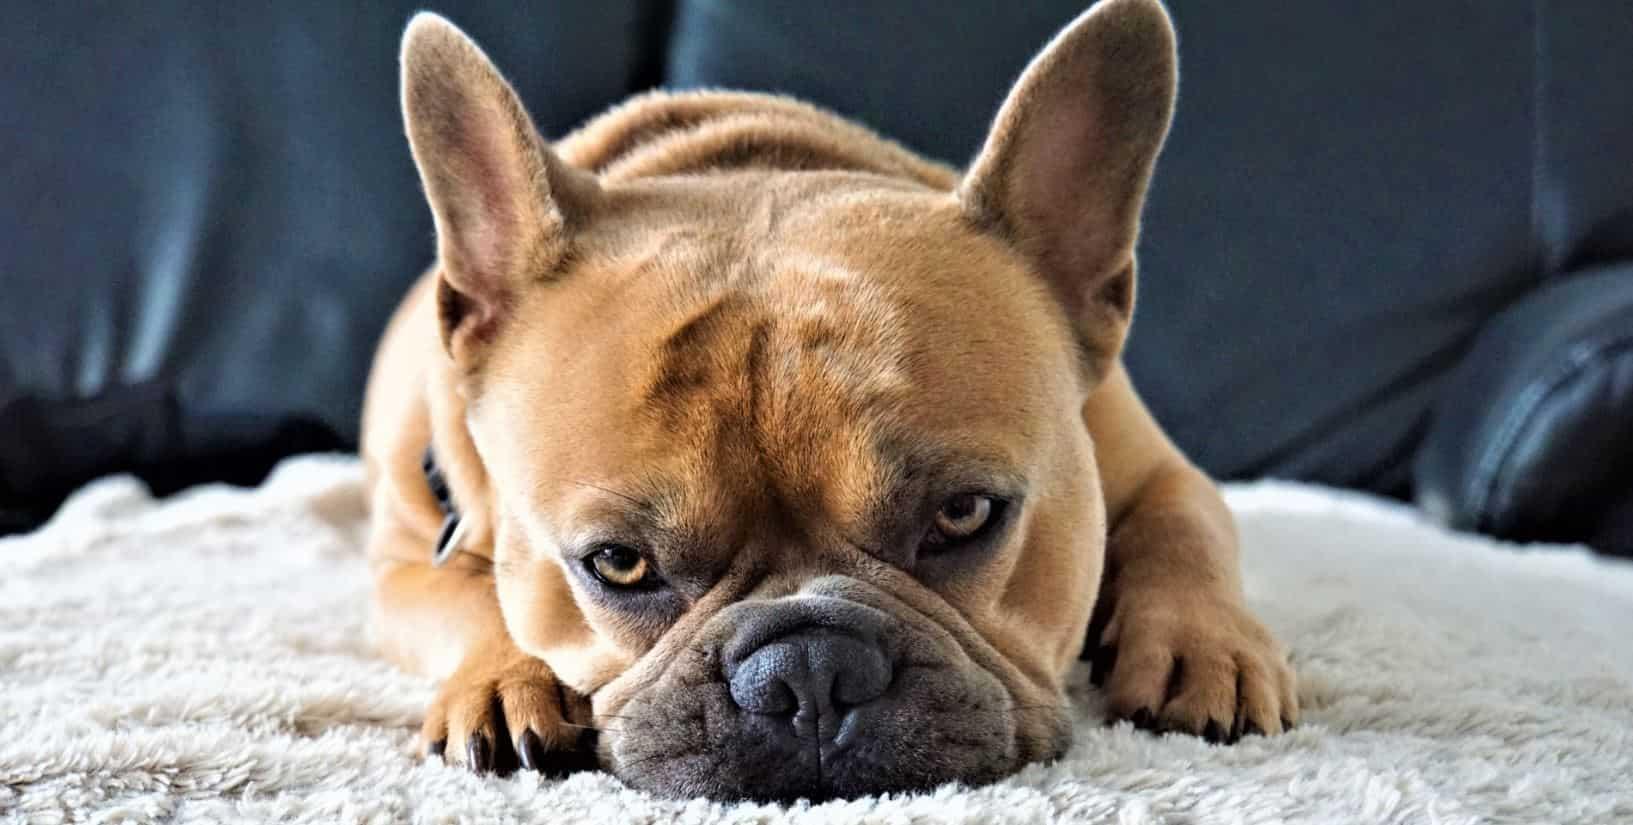 French Bulldog lies on carpet